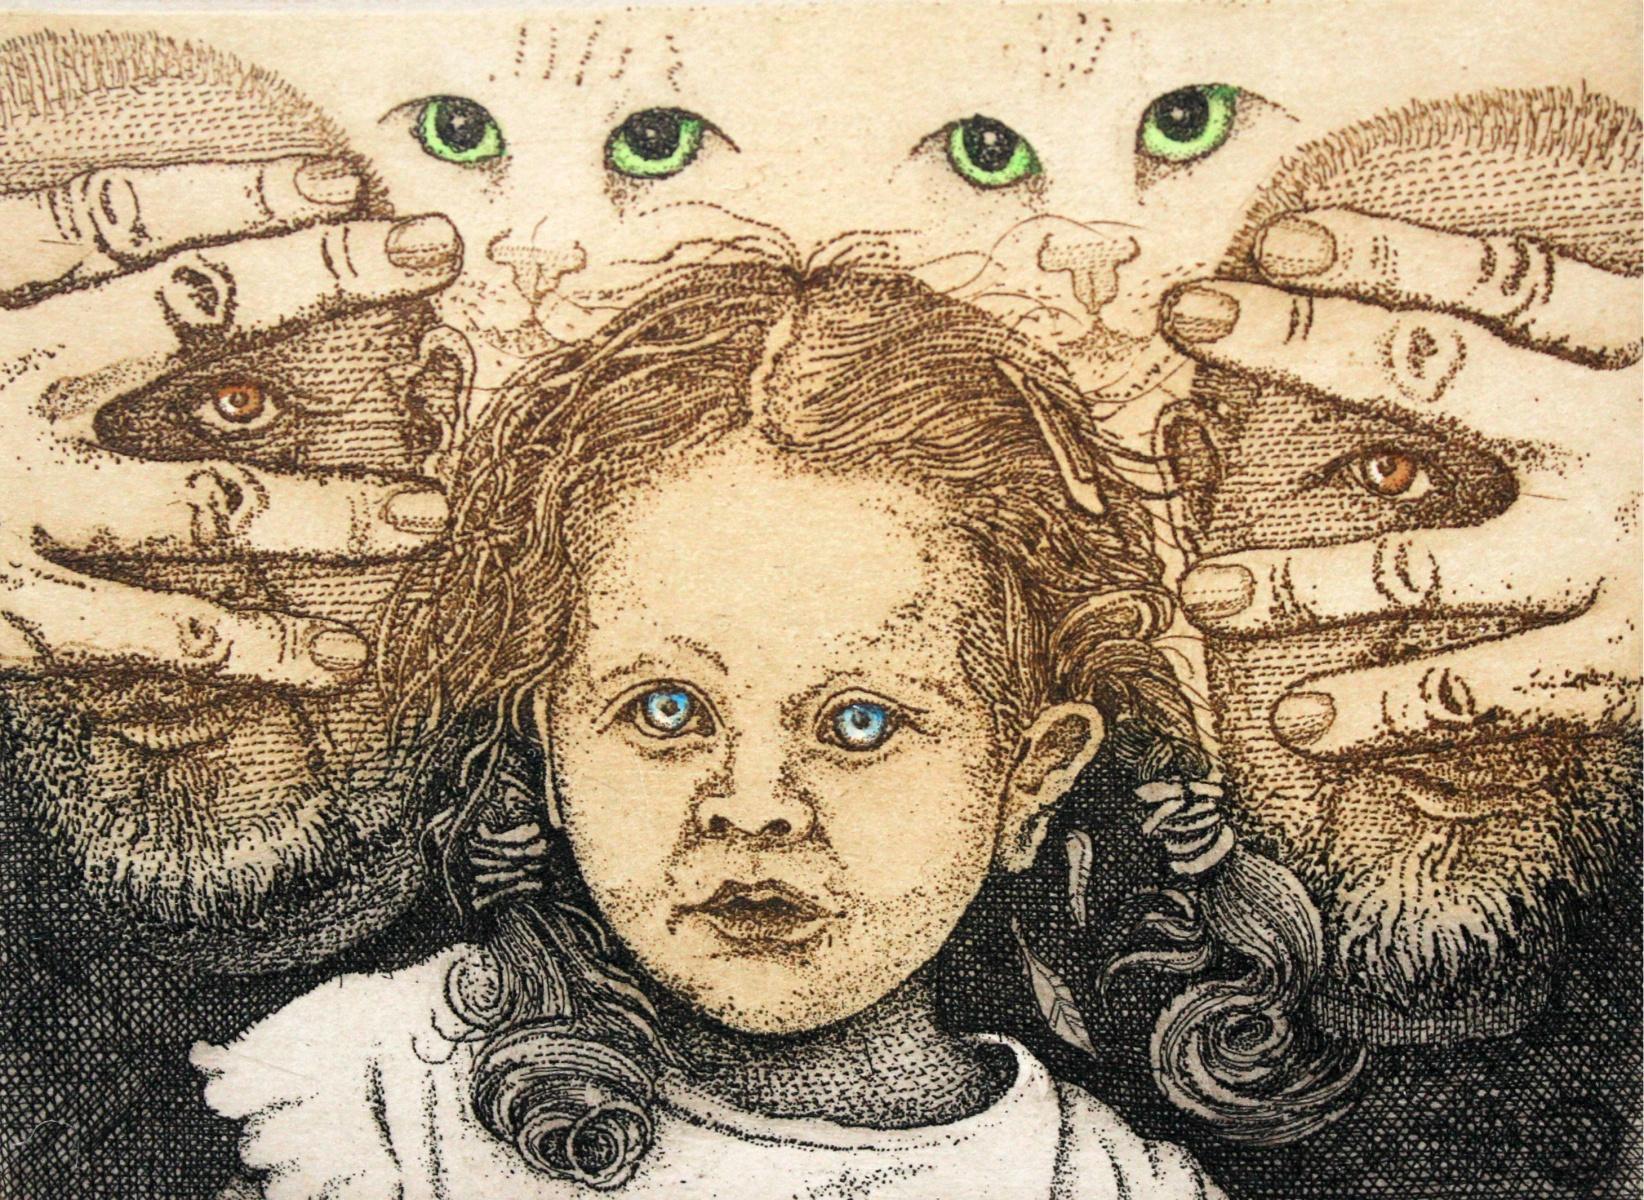 Pour Feliciter - XXI Century, Contemporary Figurative Print, Girl, Cats